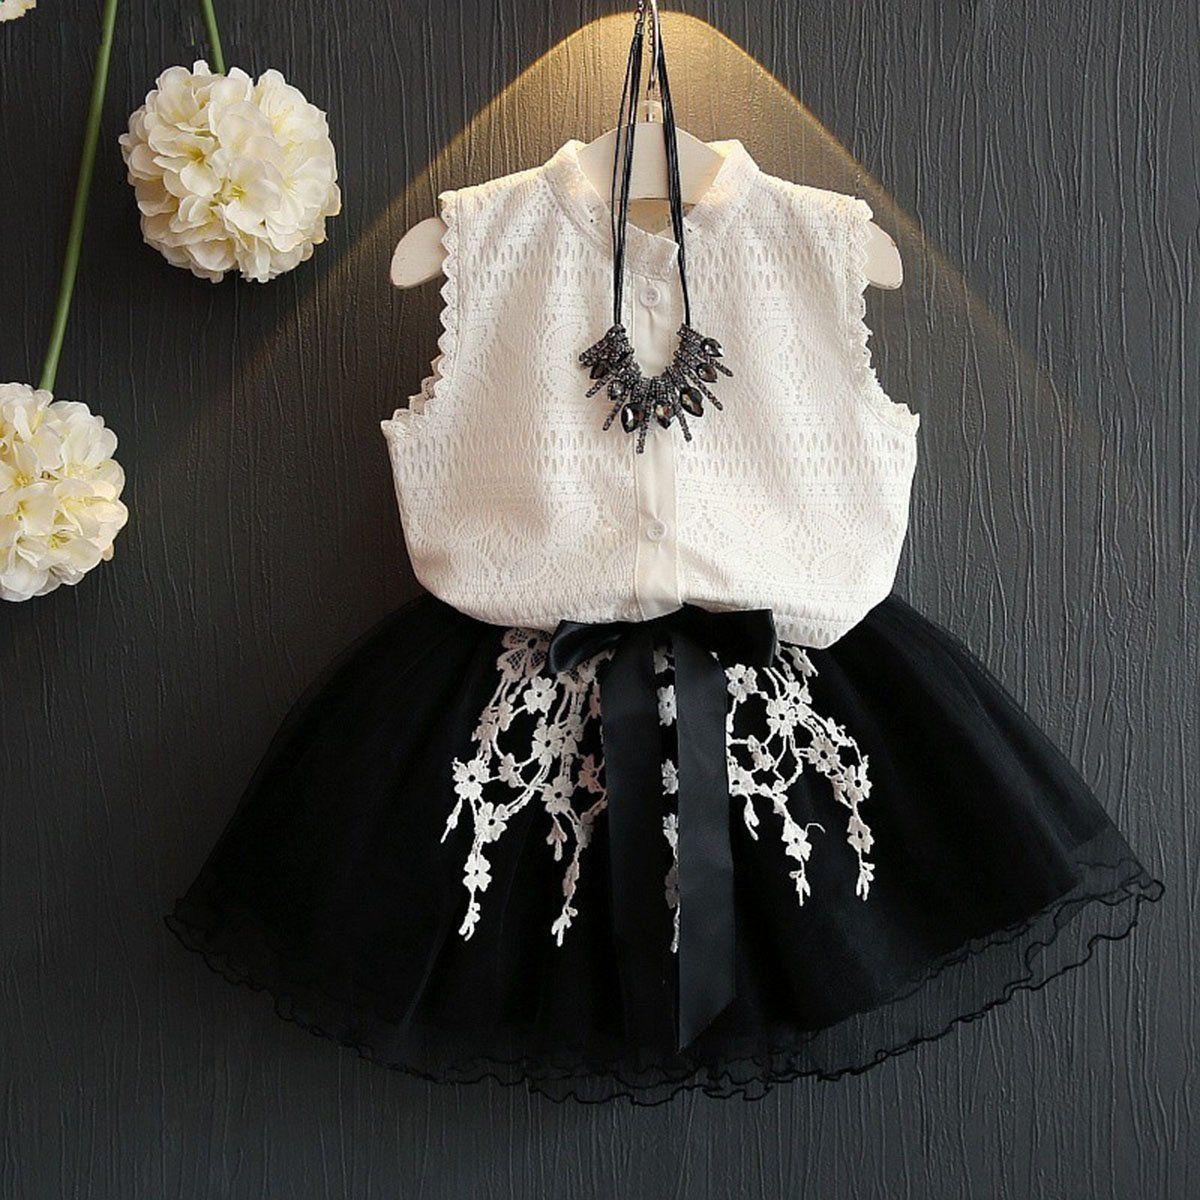 2PCs Toddler Baby Kid Girls clothes set Sleeveless lace blouse shirt Vest Tops Tutu Mesh Skirt White Black suit Outfits 2-7T inc international concepts new white sleeveless linen blouse 2 $48 99 dbfl